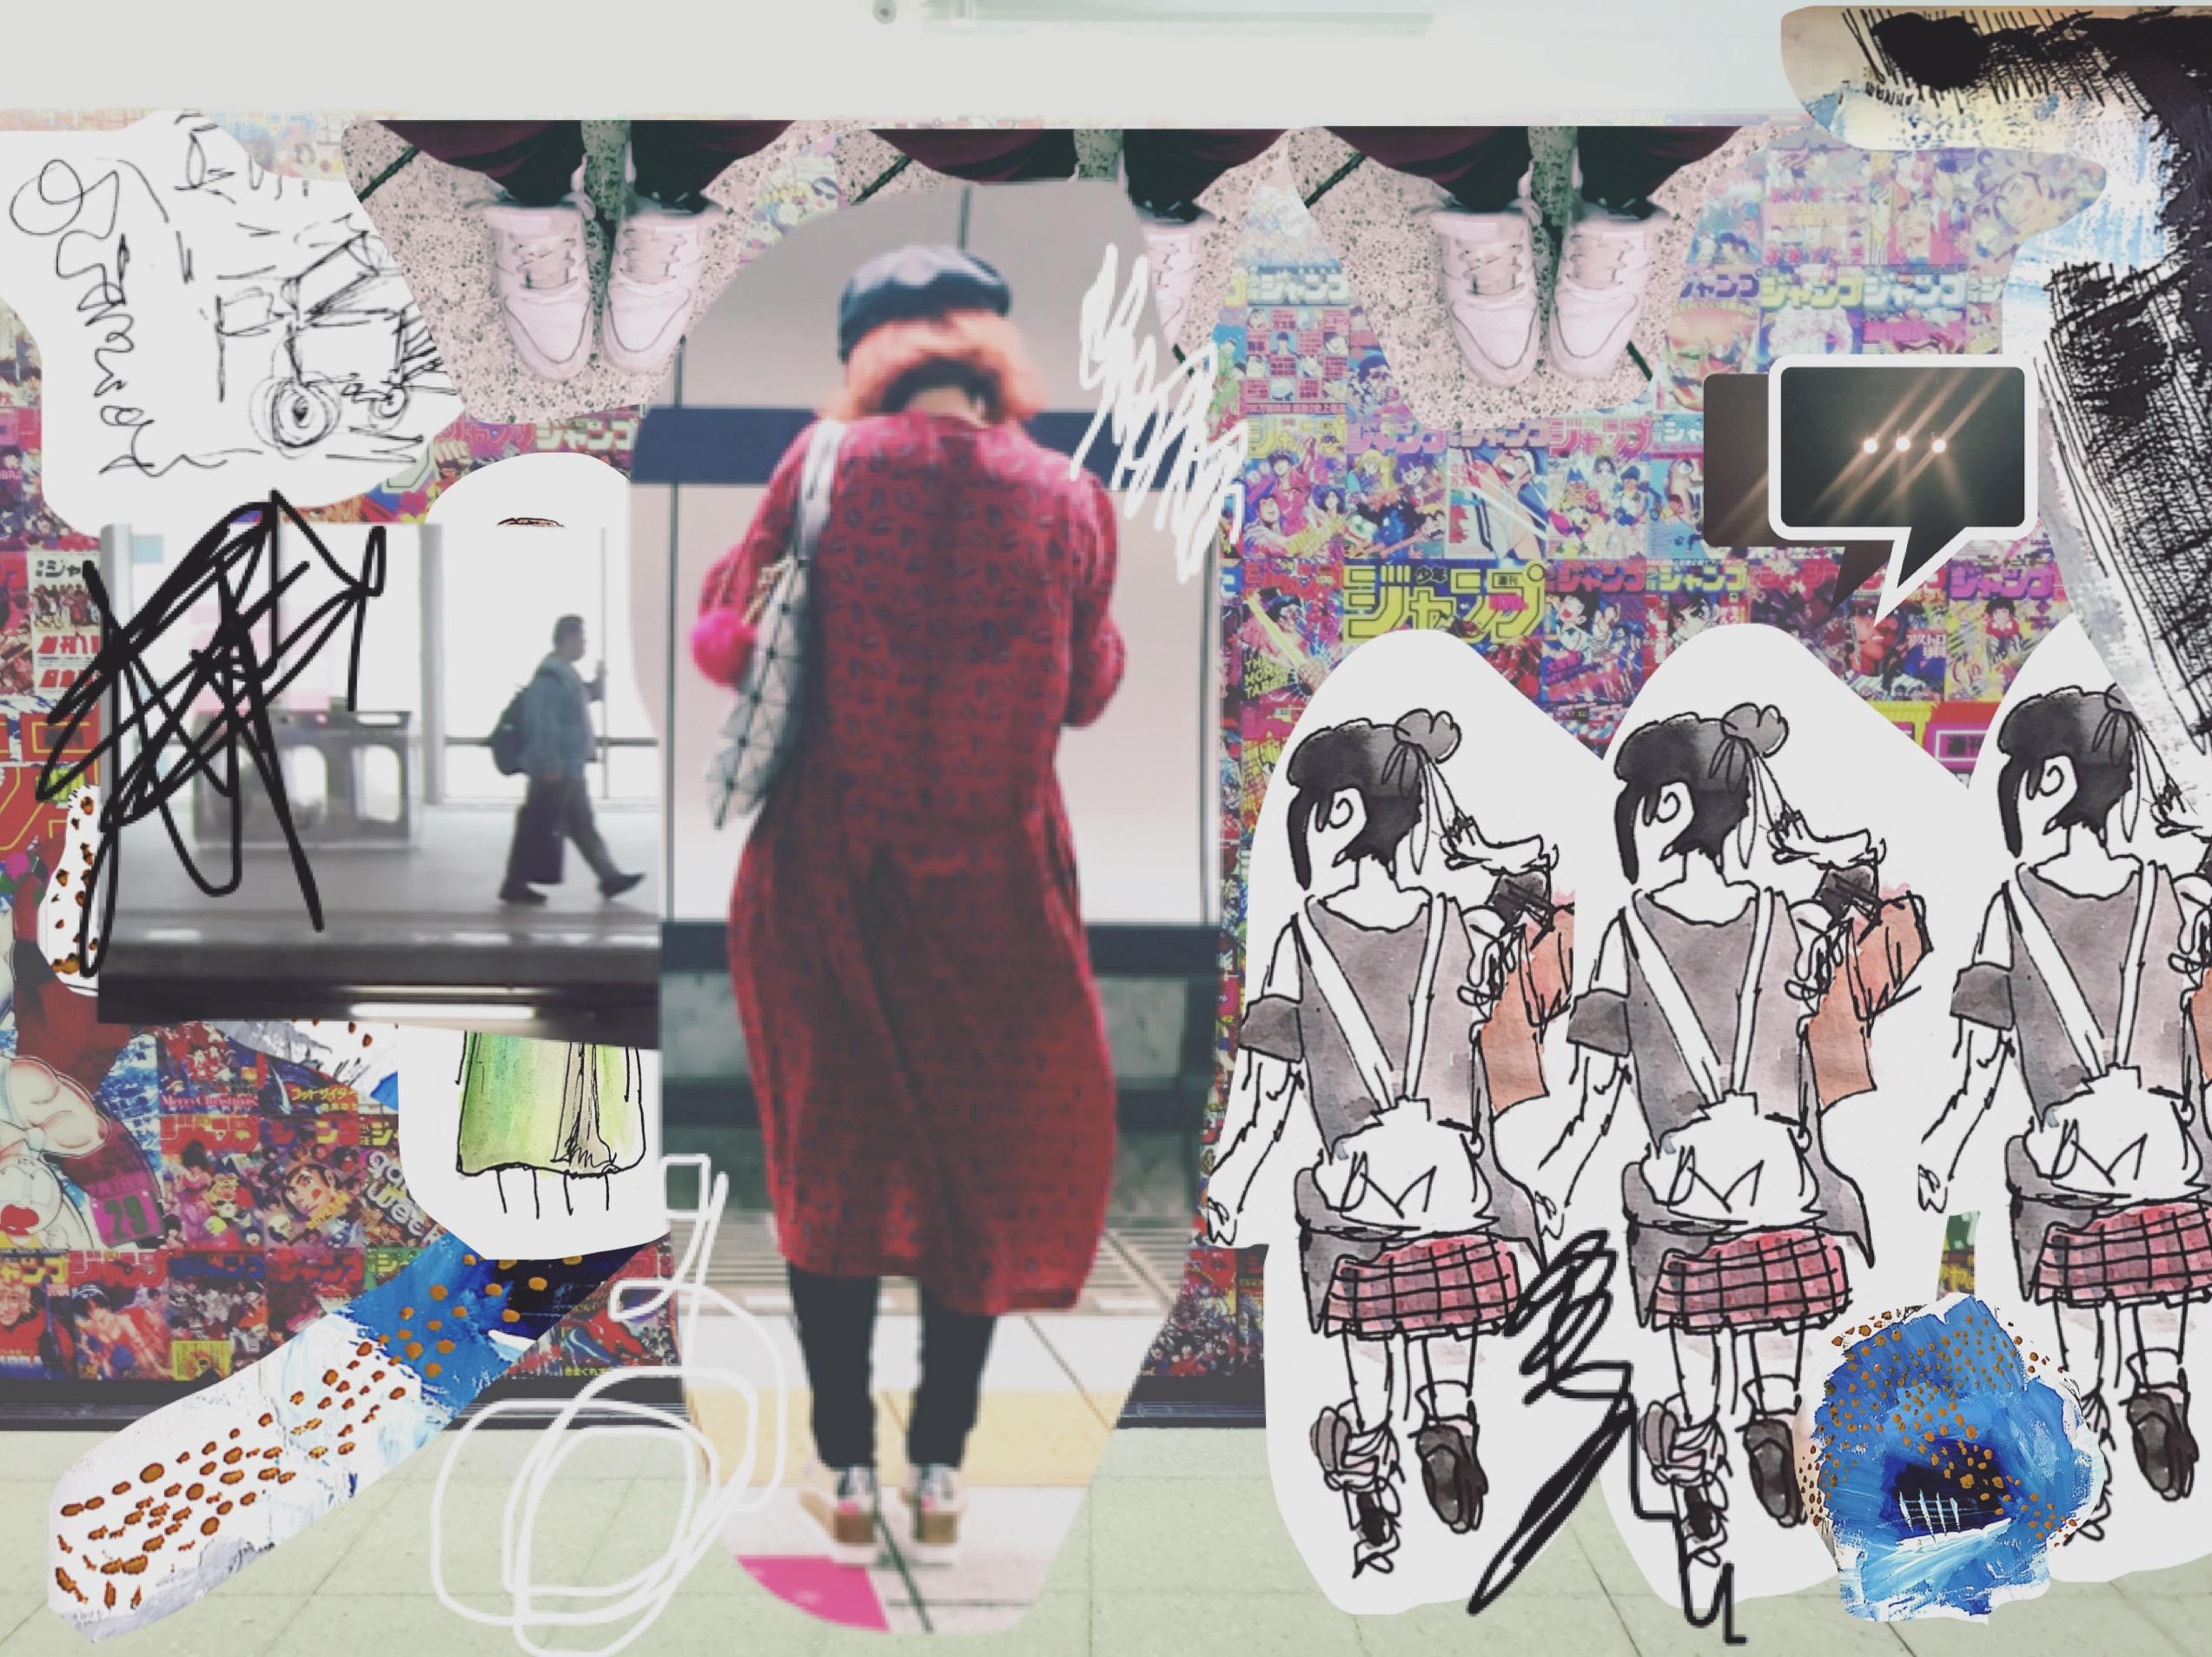 tokyo sendai collage - 14072017